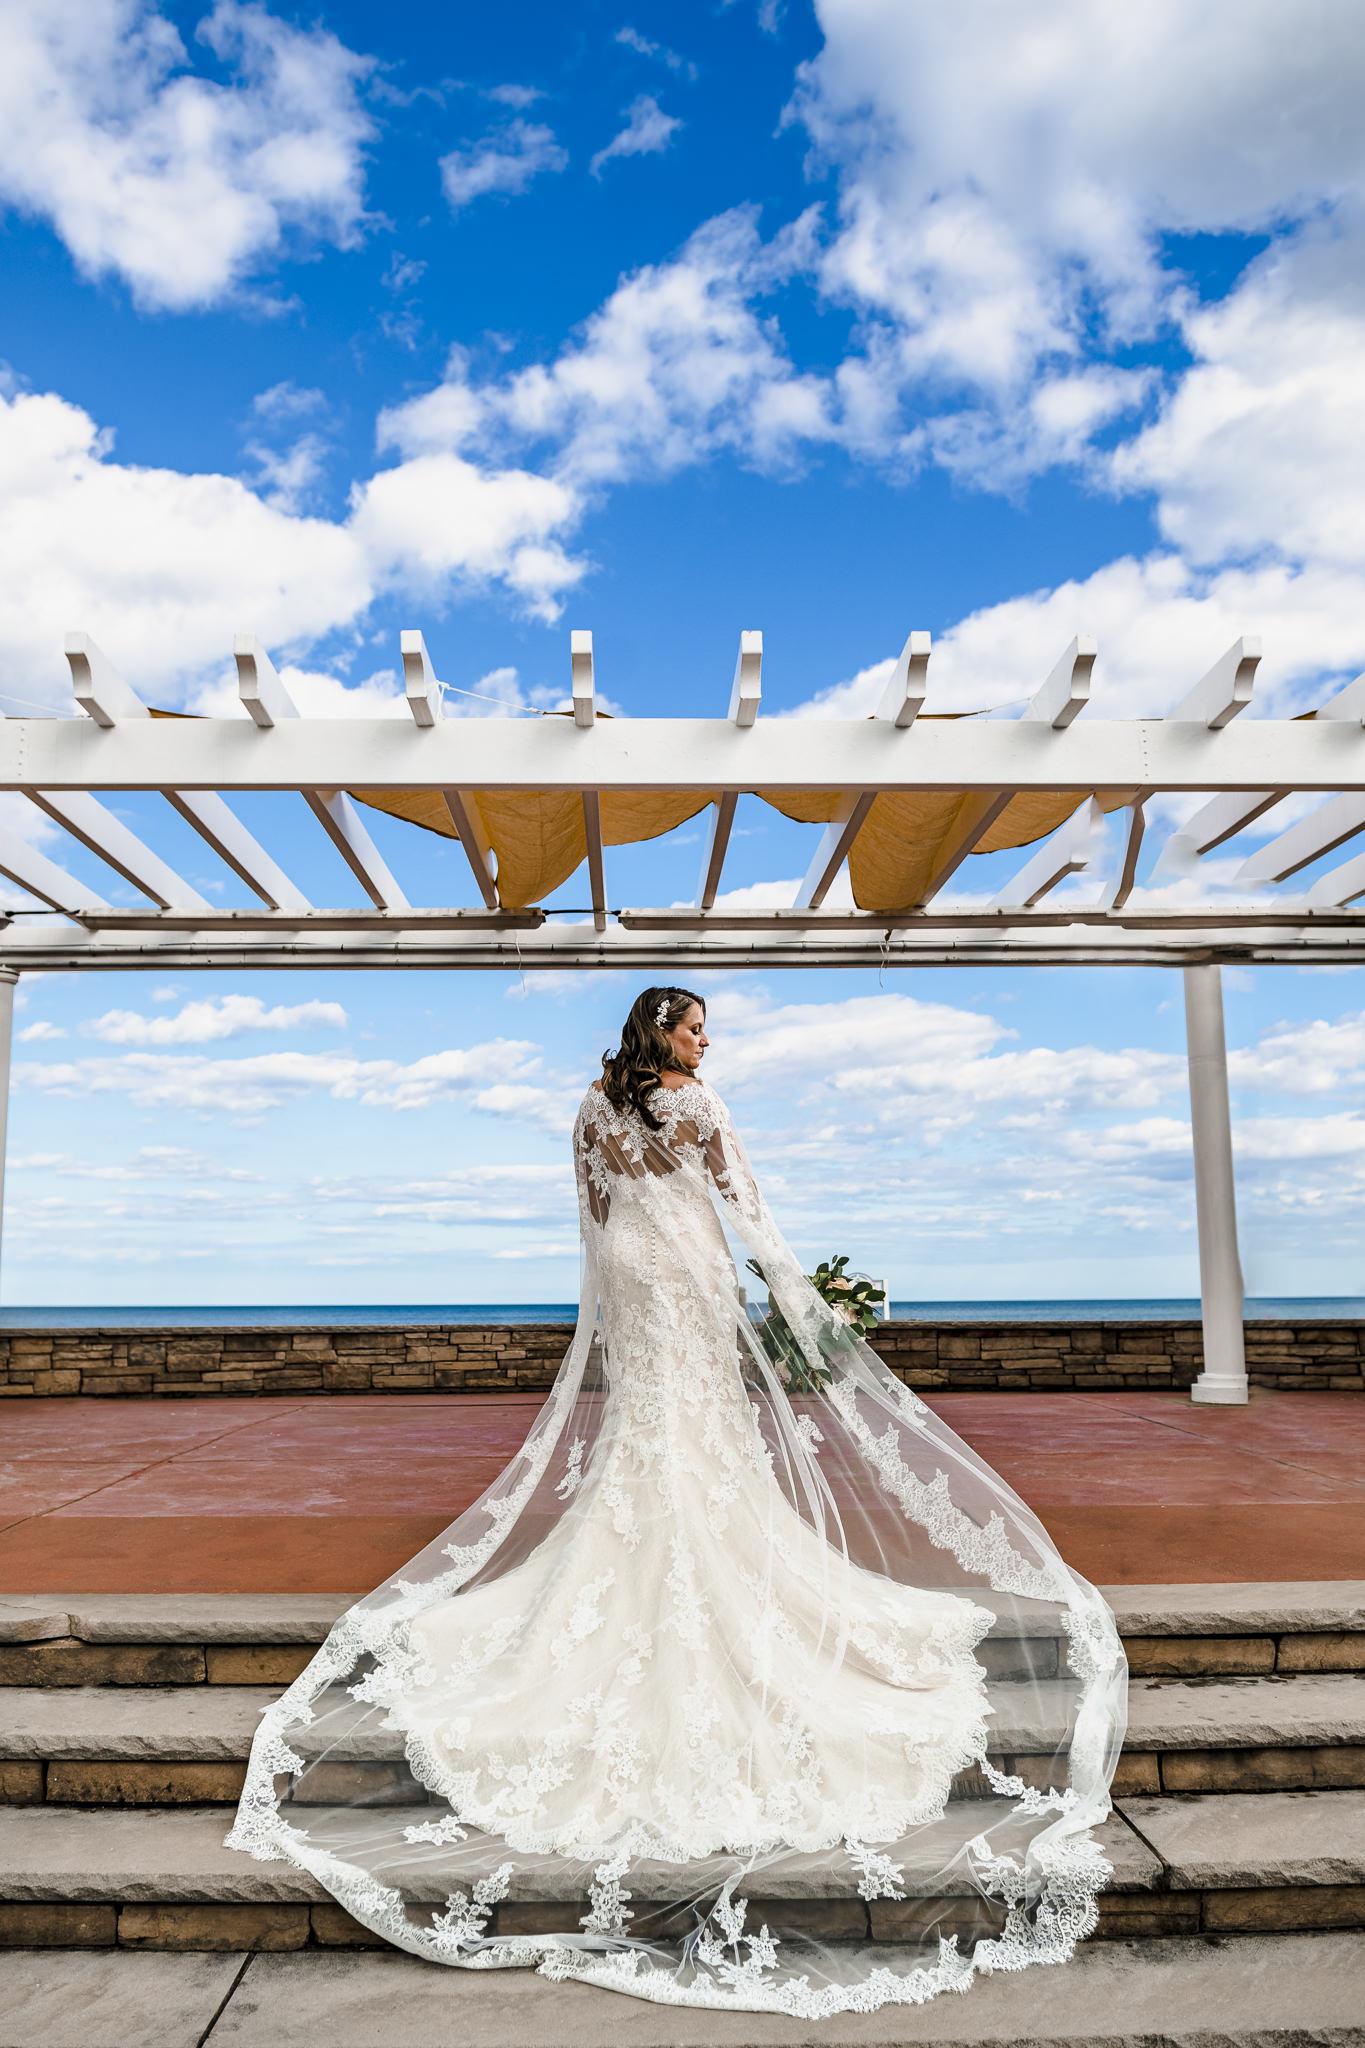 Culos-Sheraton-Eatontown-Long-Branch-Wedding-Photographer-12.JPG